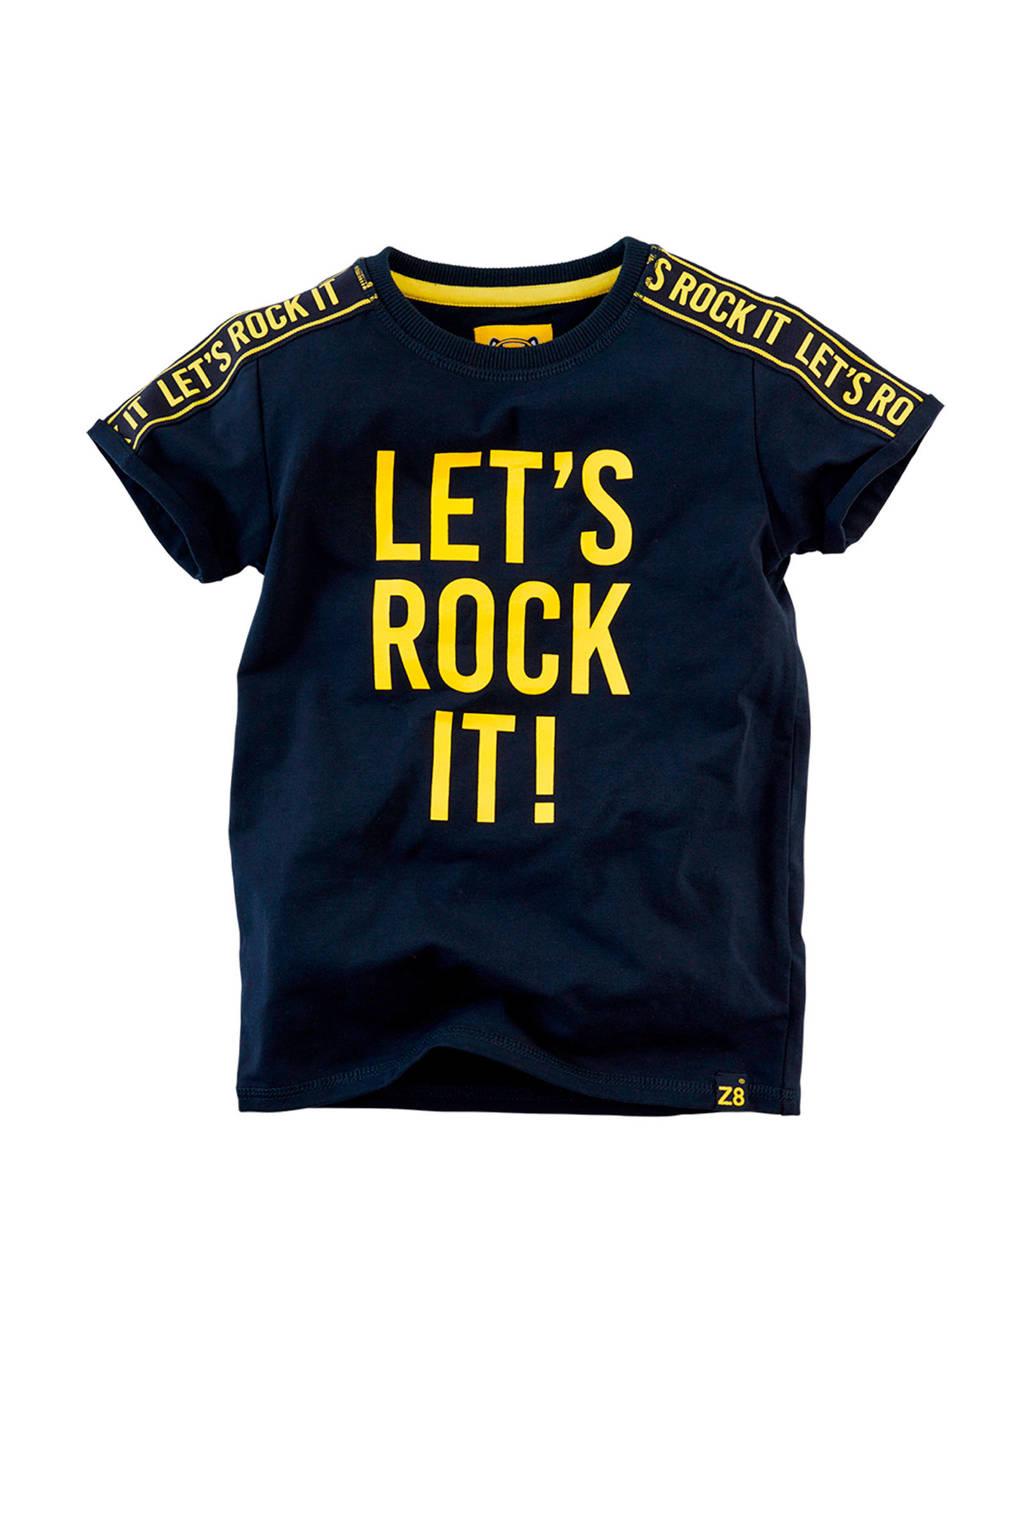 Z8 T-shirt Ramses met contrastbies donkerblauw/geel, Donkerblauw/geel